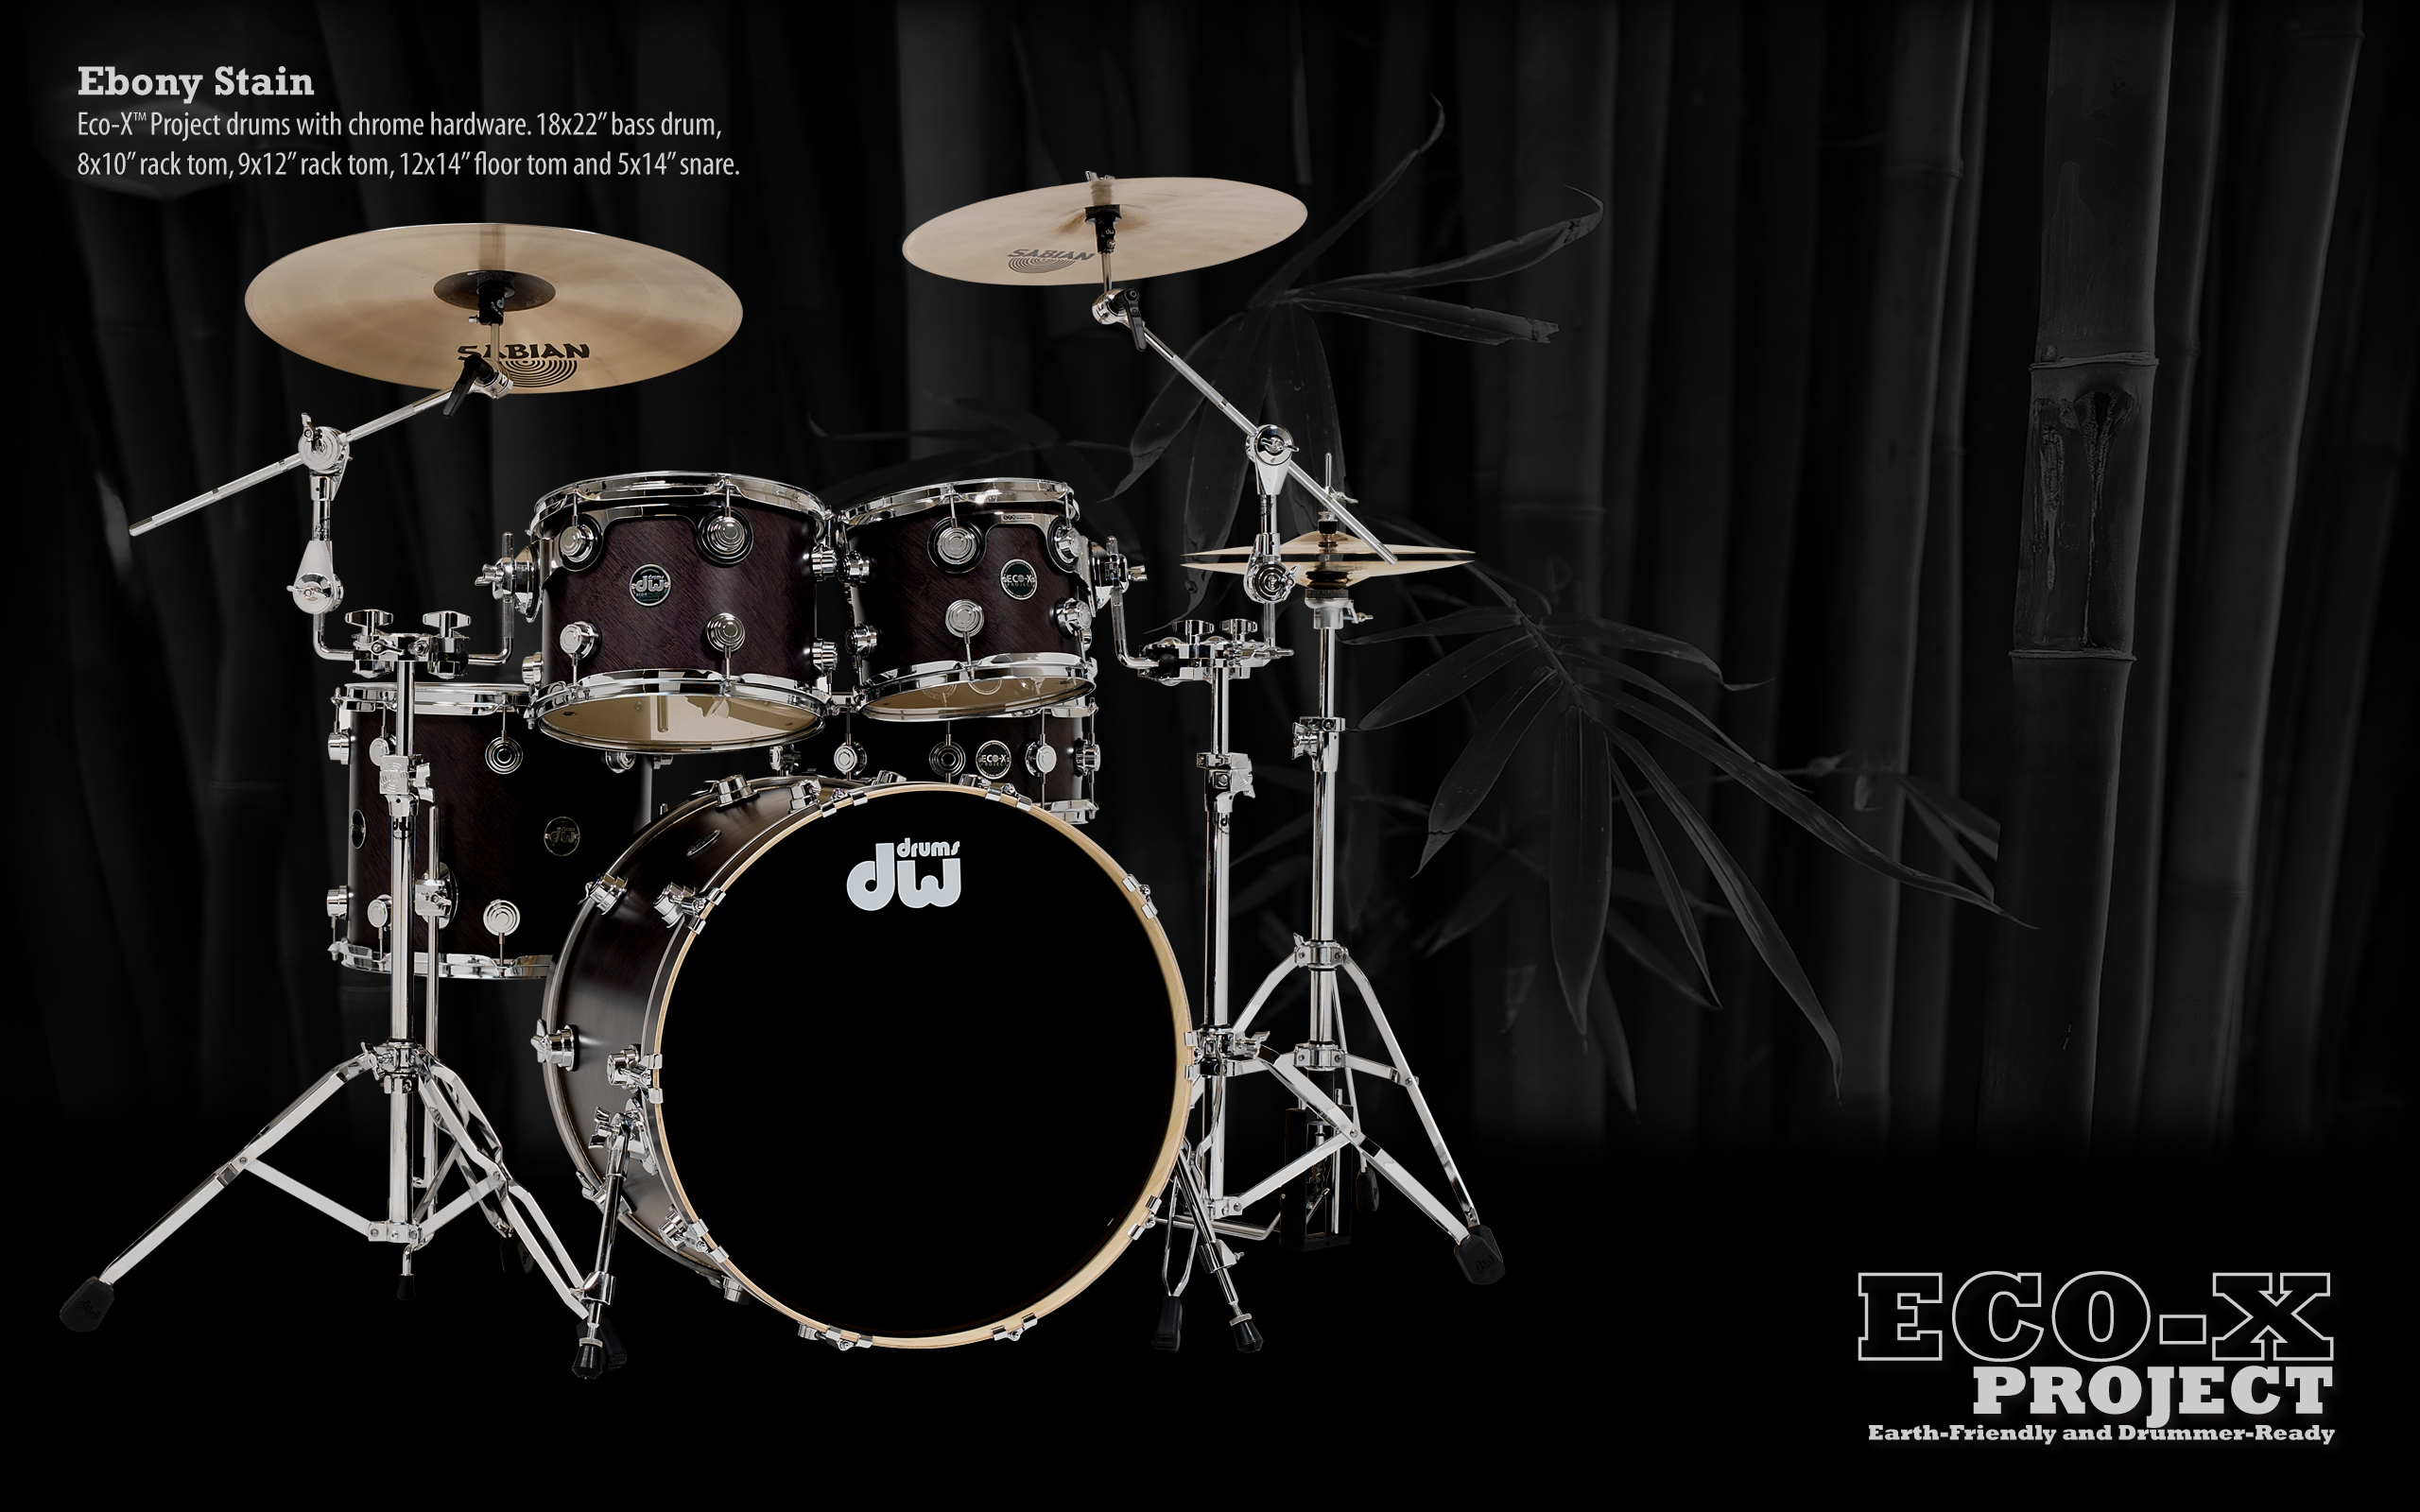 78 dw drums wallpaper on wallpapersafari - Set video as wallpaper ...